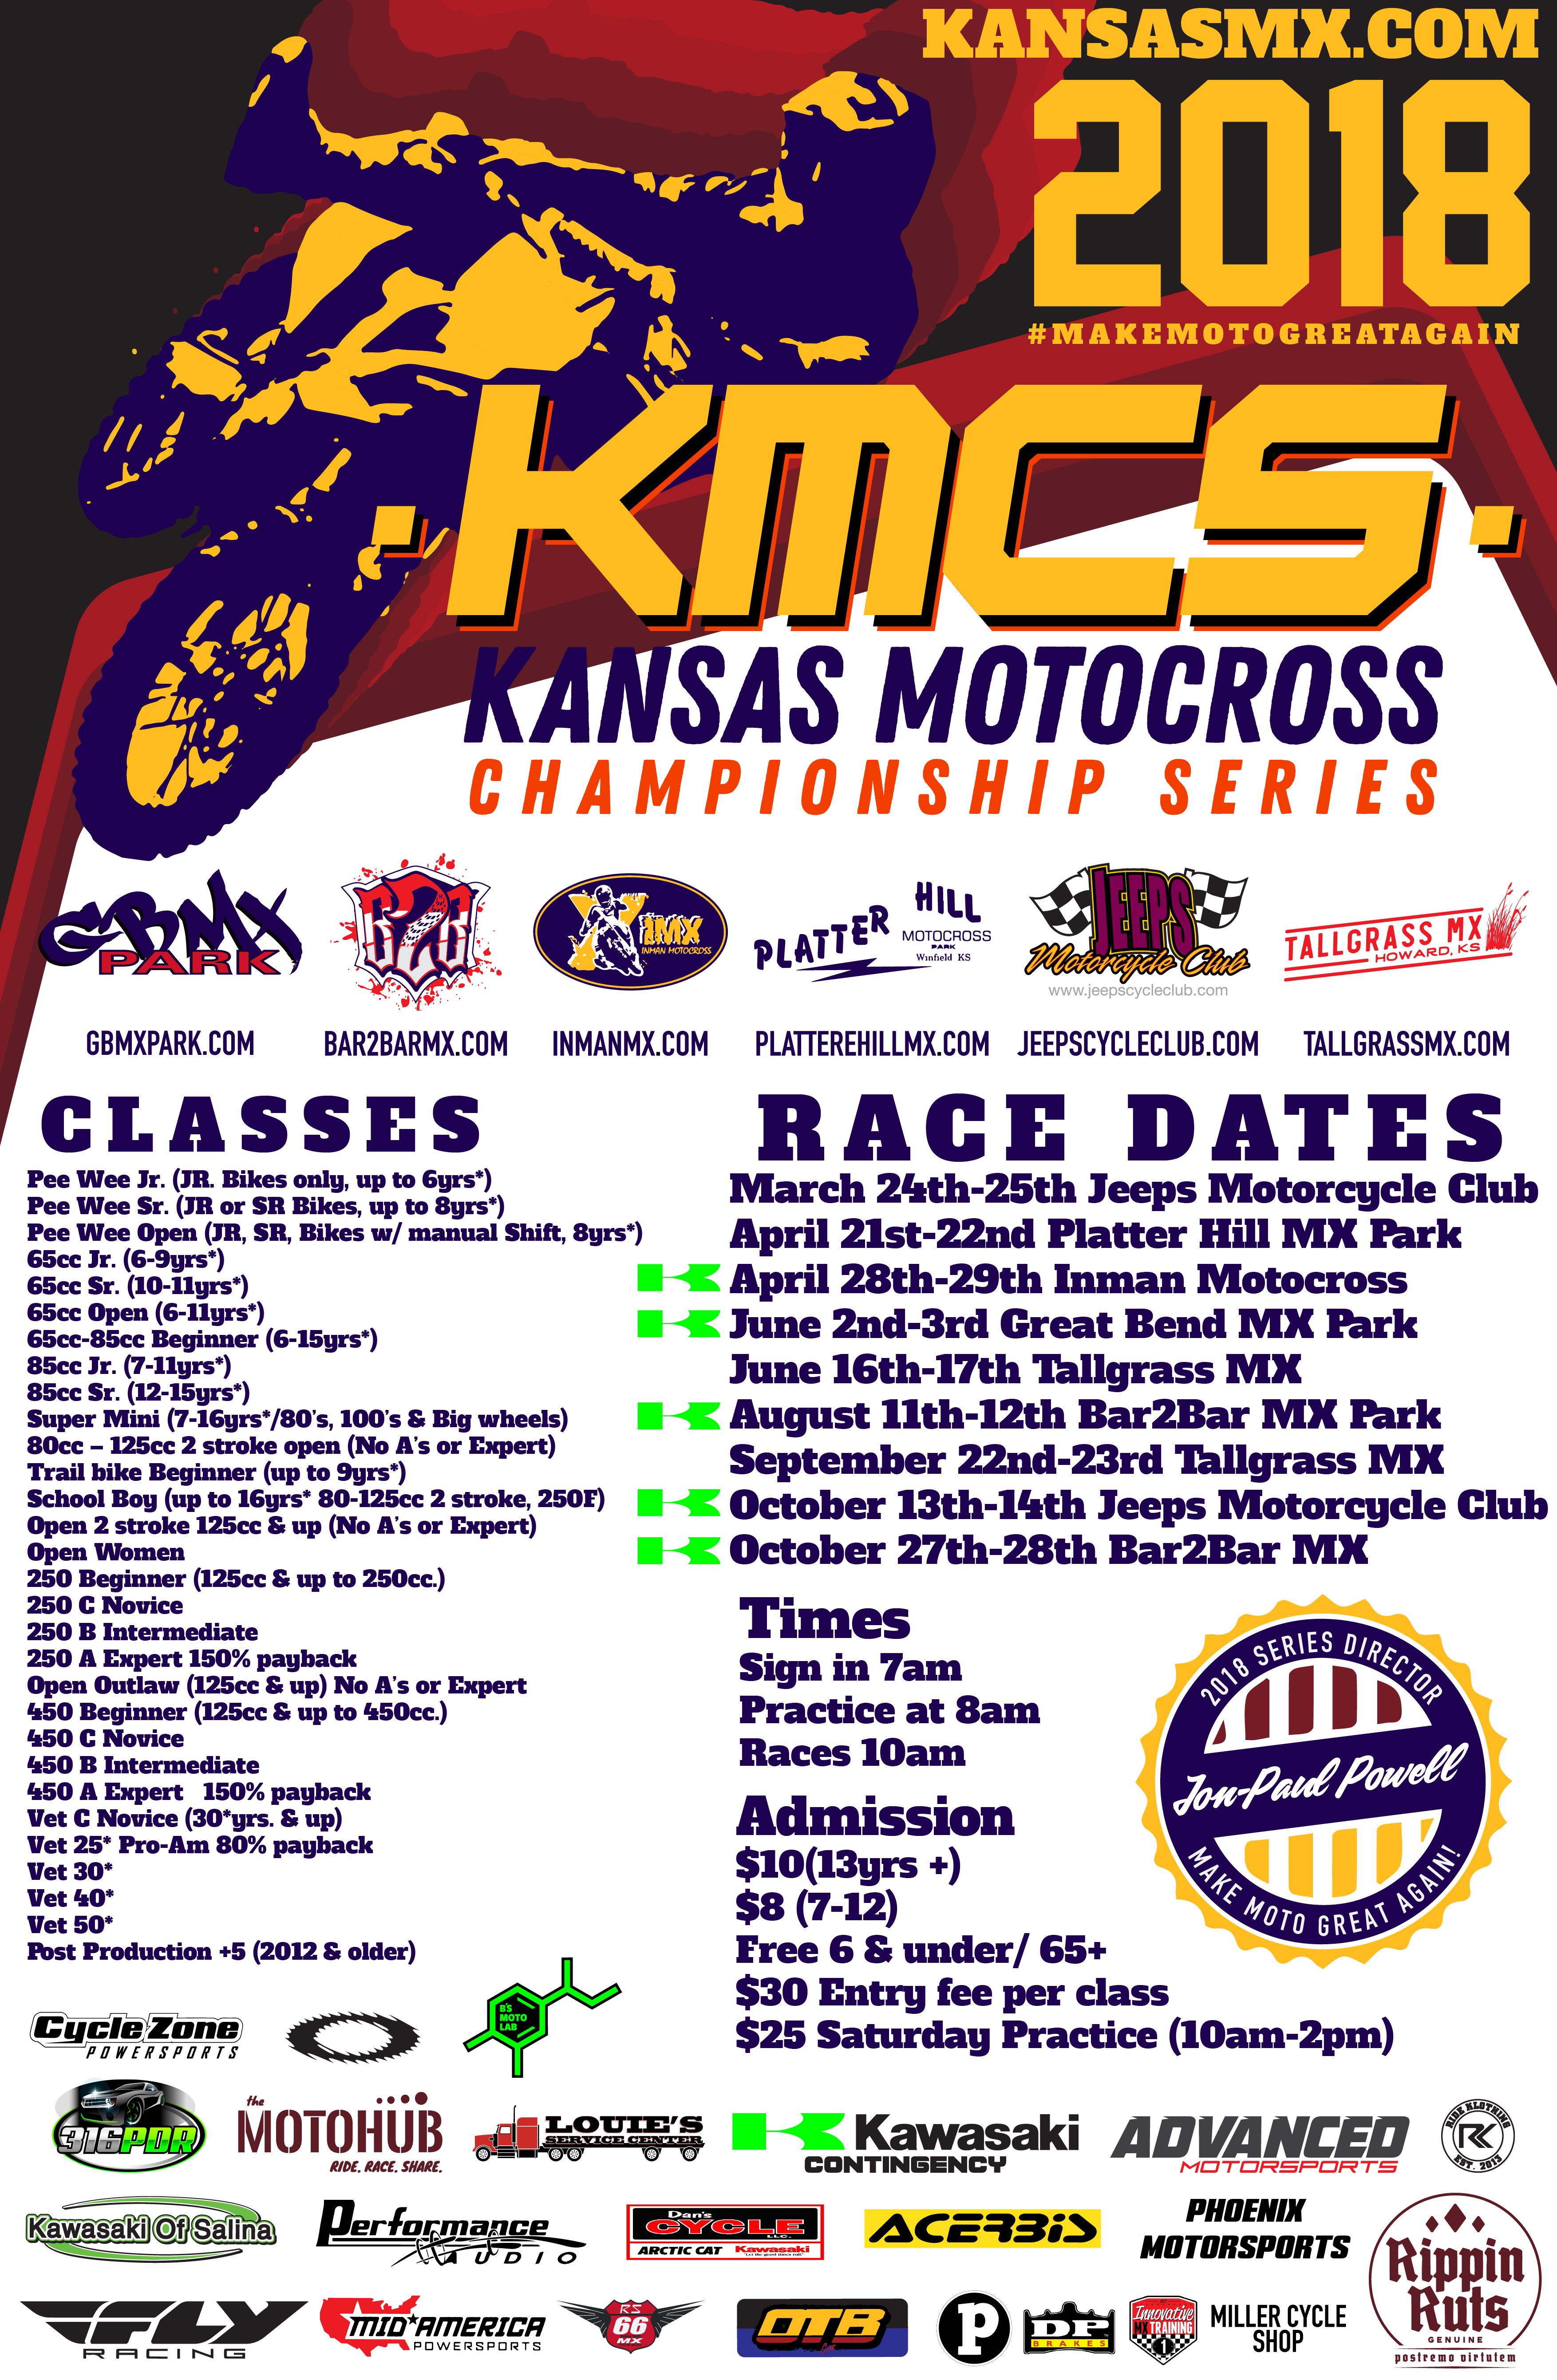 KMCSRacePoster2018